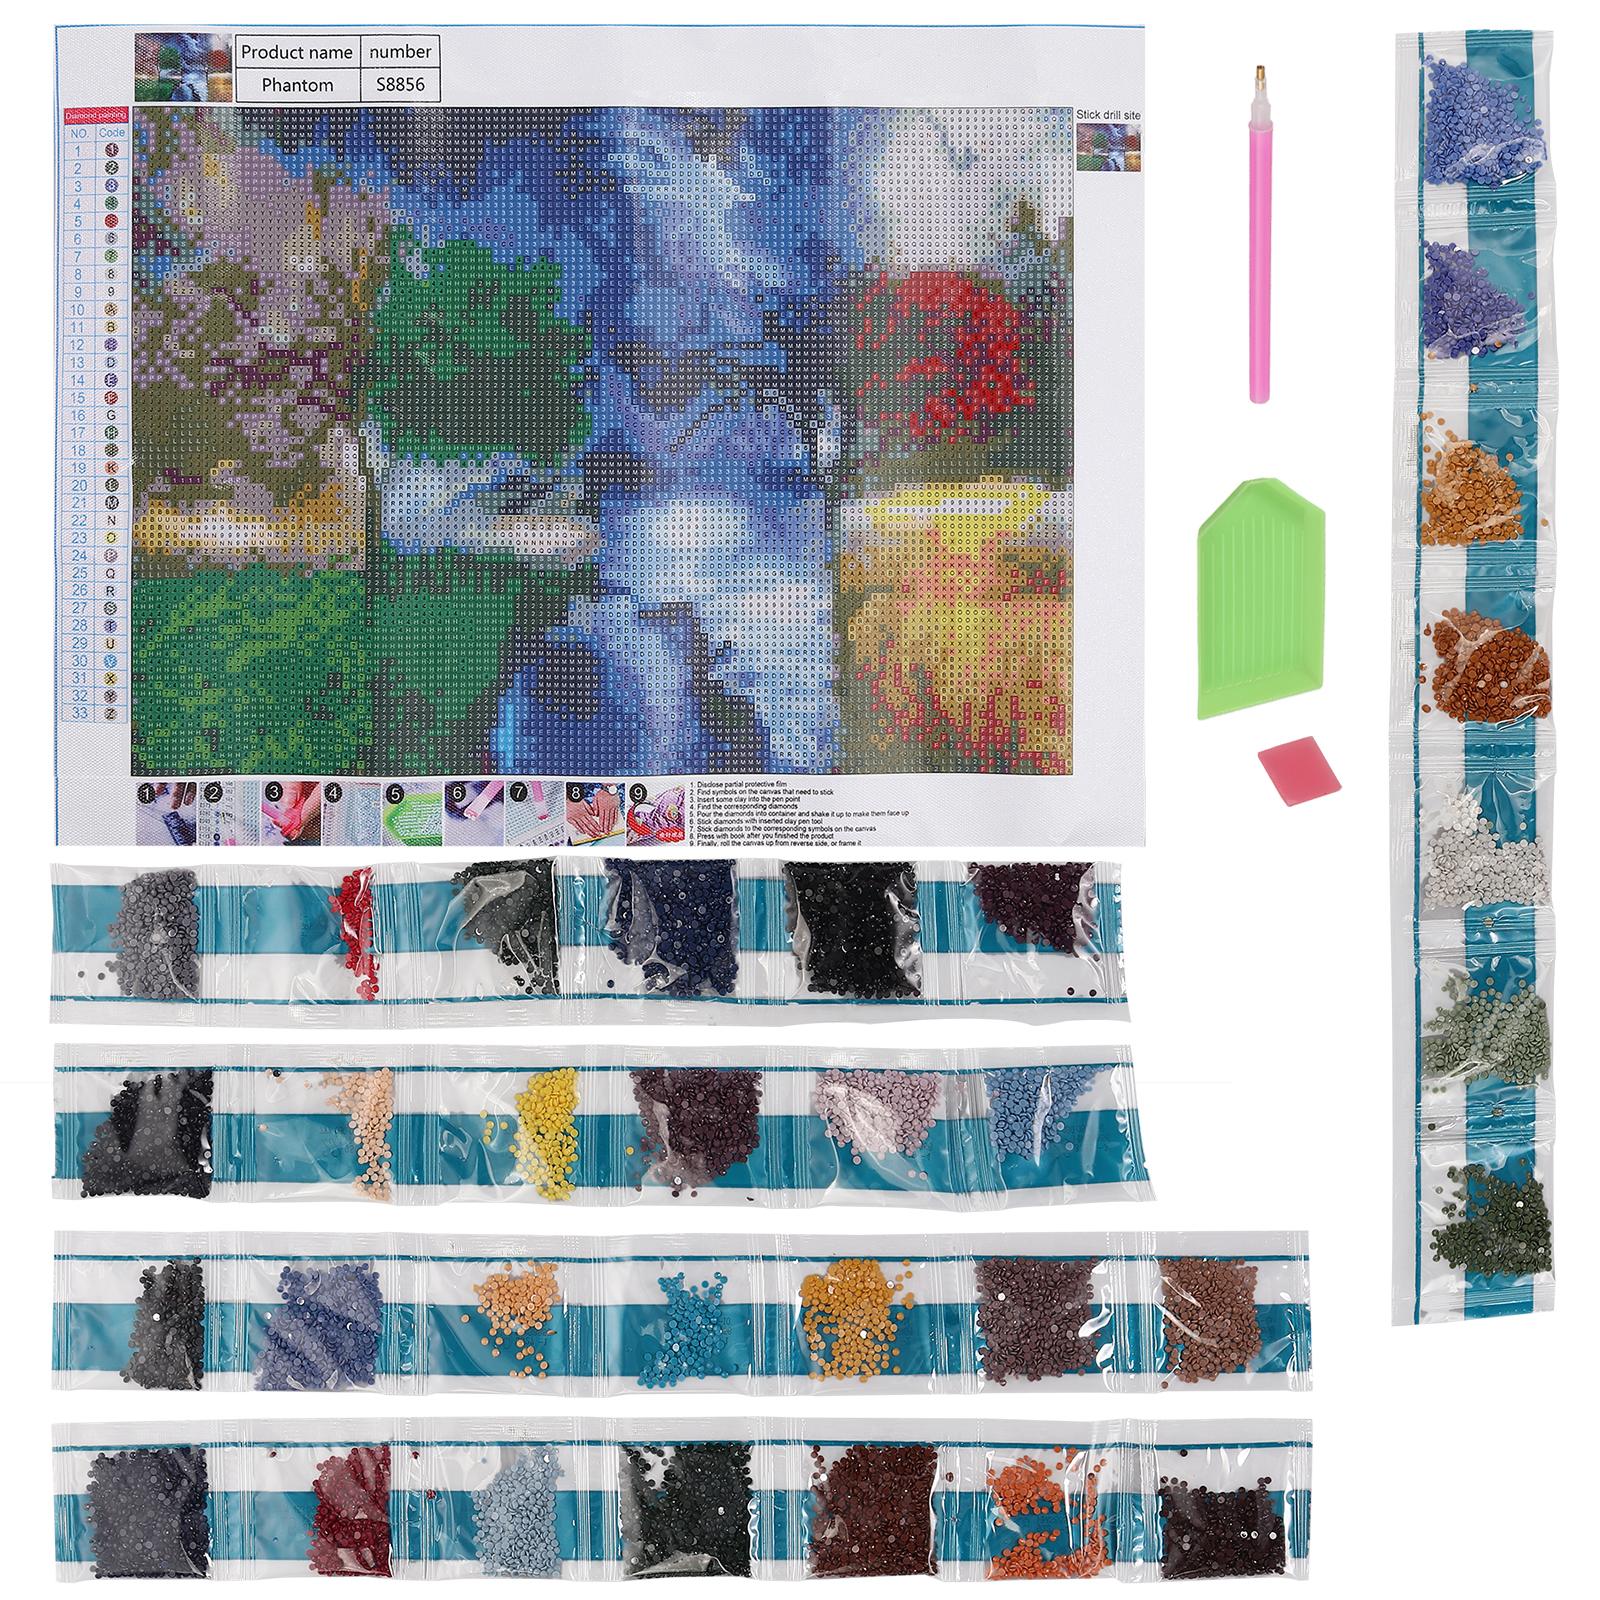 DIY 5D Diamond Painting Full Drill Embroidery Cross Craft Stitch Kits Home Decor